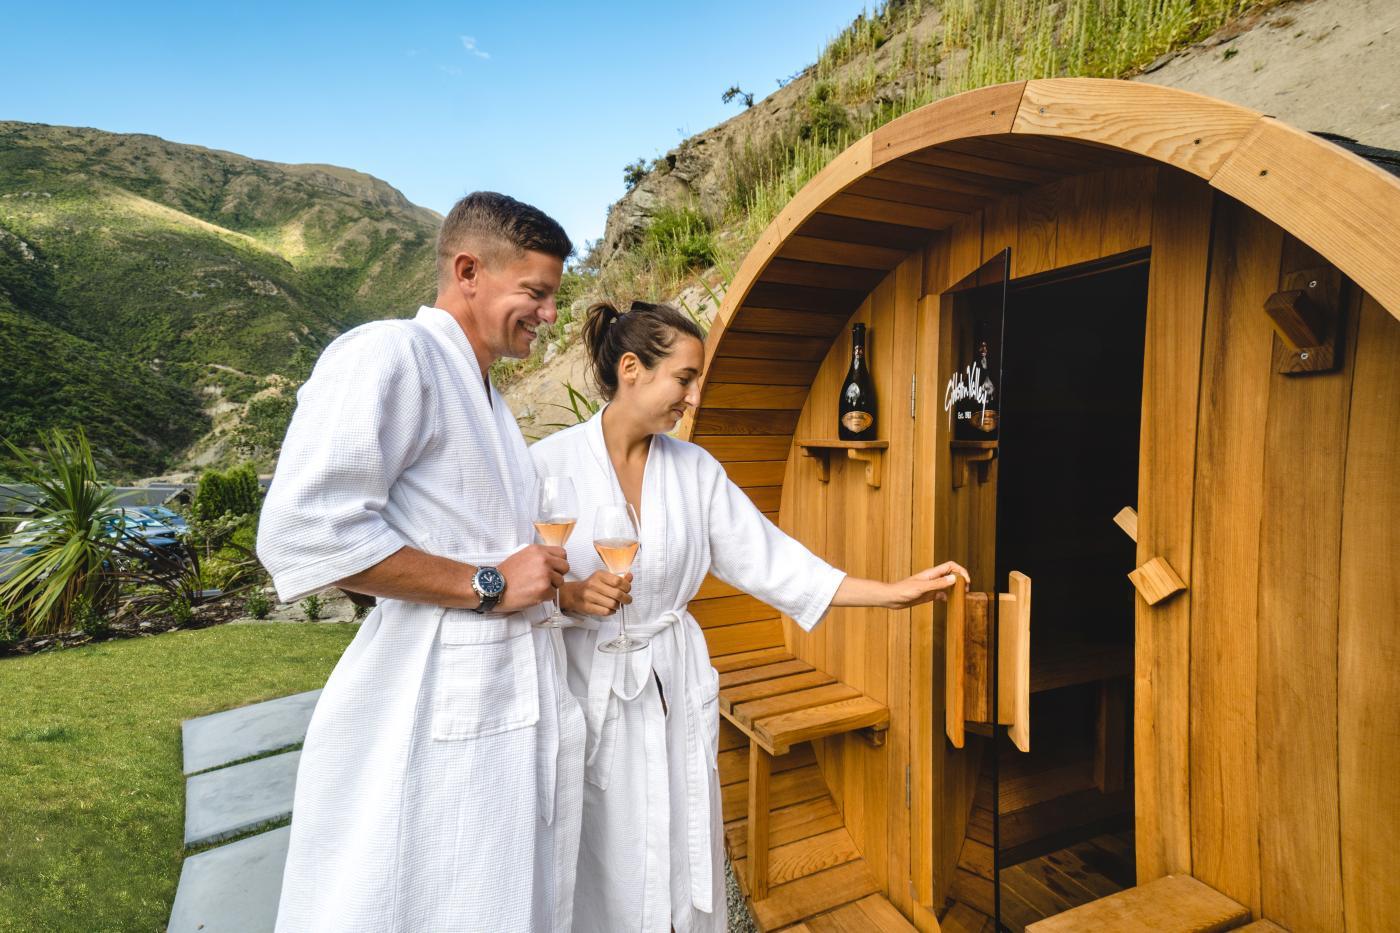 Man and woman entering a wine-barrel sauna